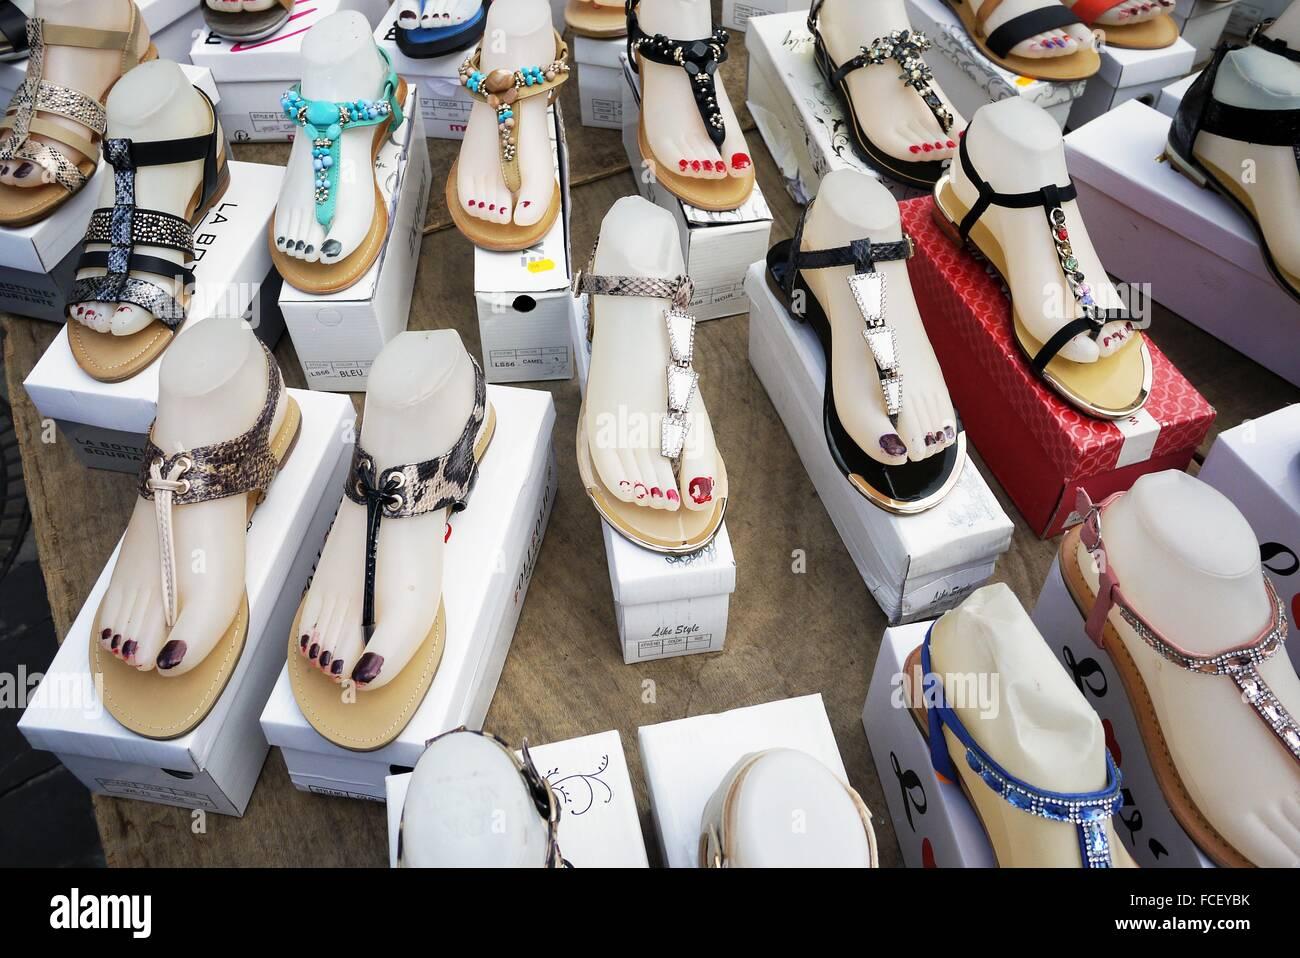 Summer sandals on sale Stock Photo - Alamy